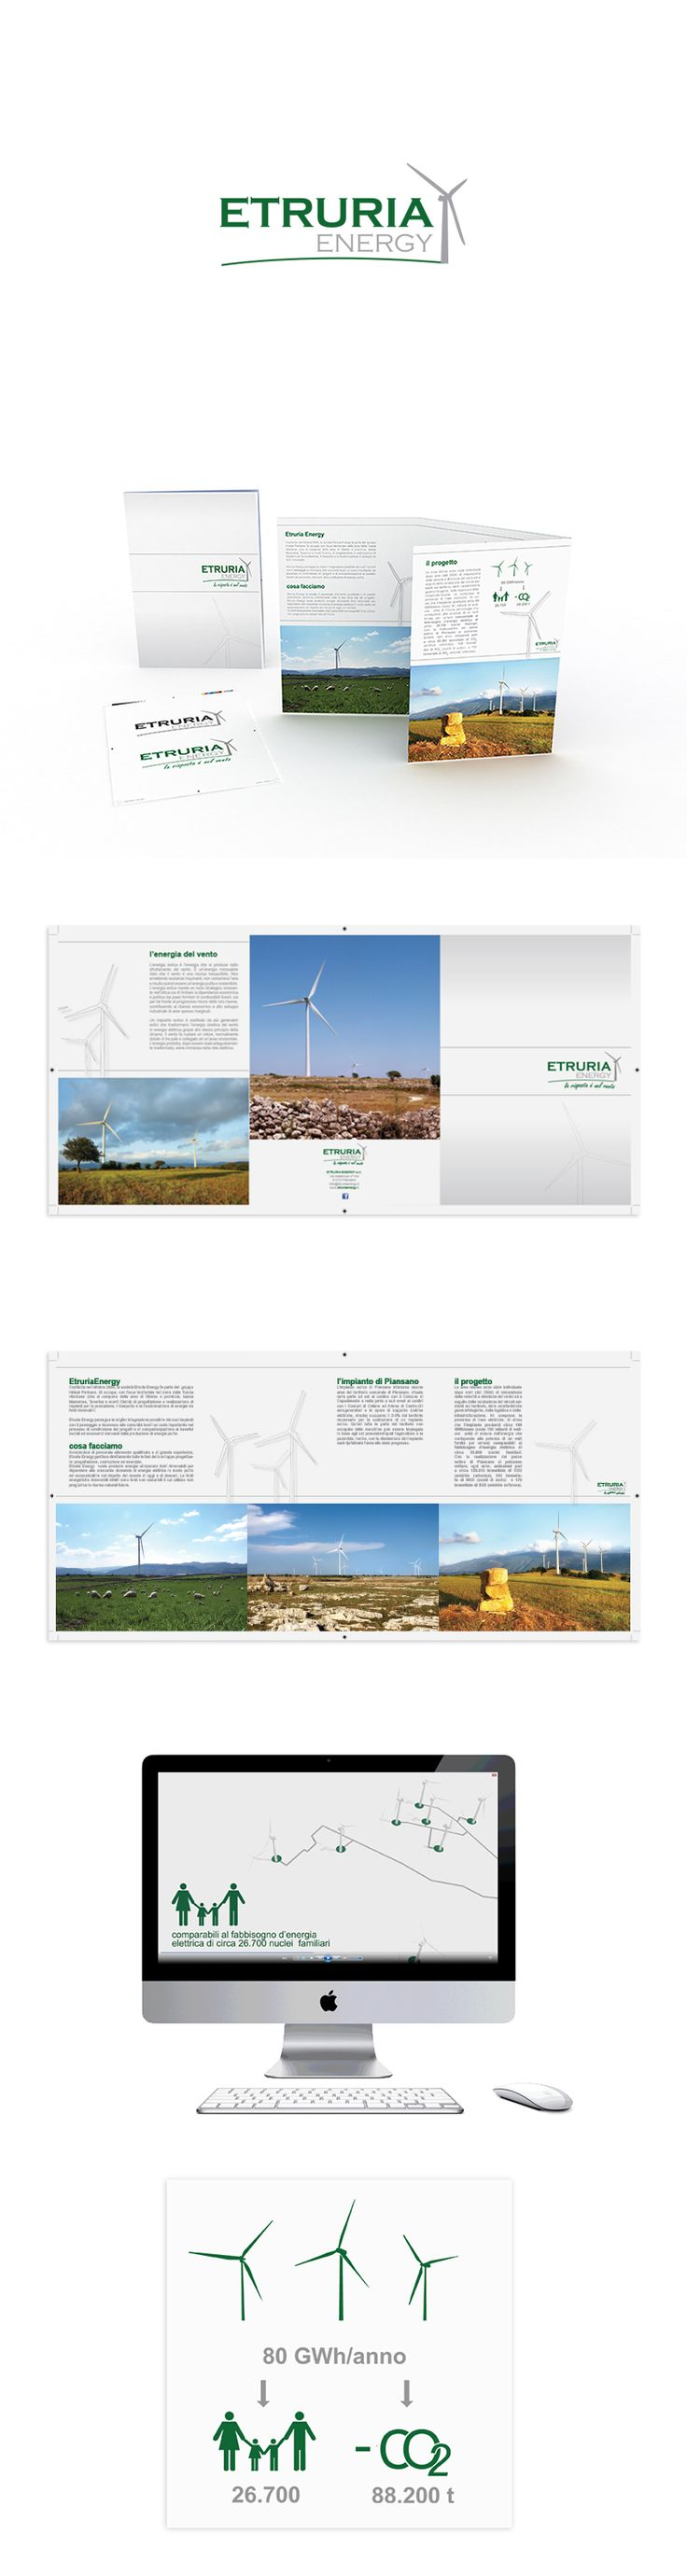 Etruria Energy, Brand Design ─ Giulio Patrizi Design Agency ©   #branding #brand #identity #corporate #graphic #design